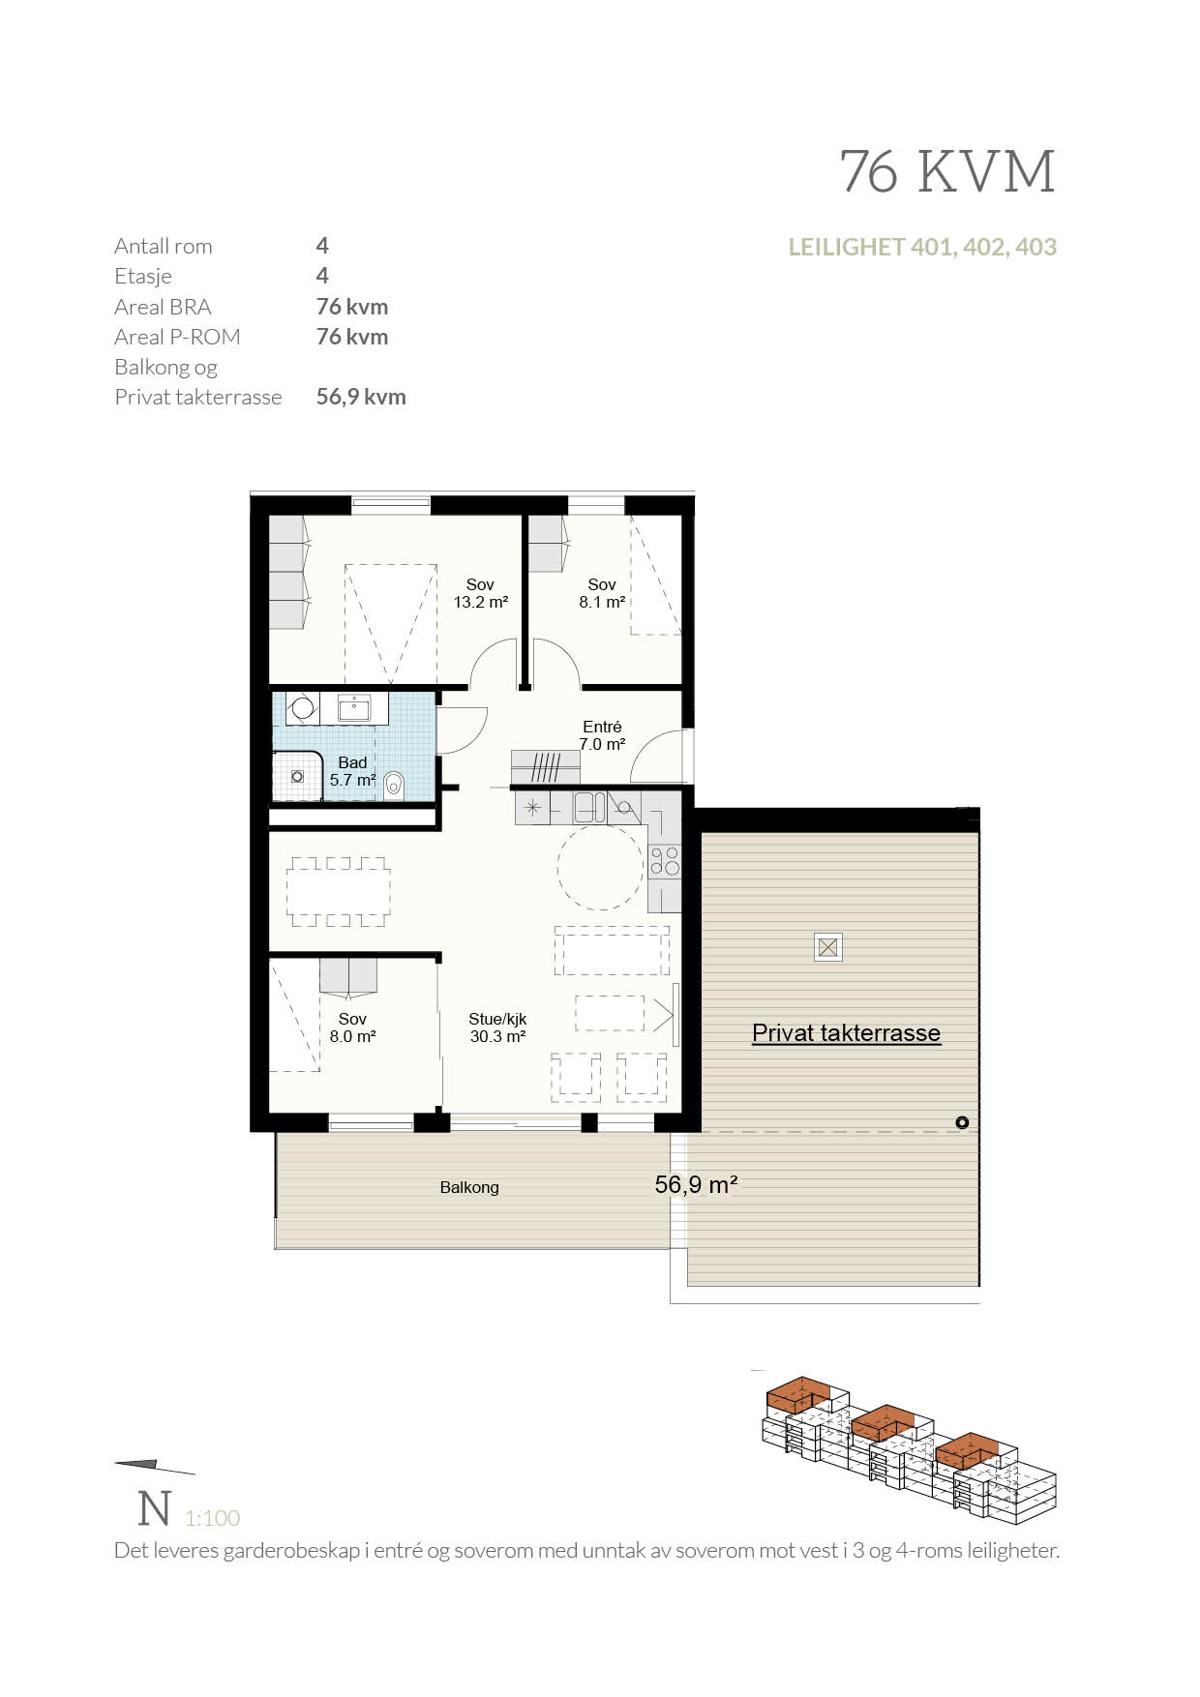 Plantegning Penthouse - 403